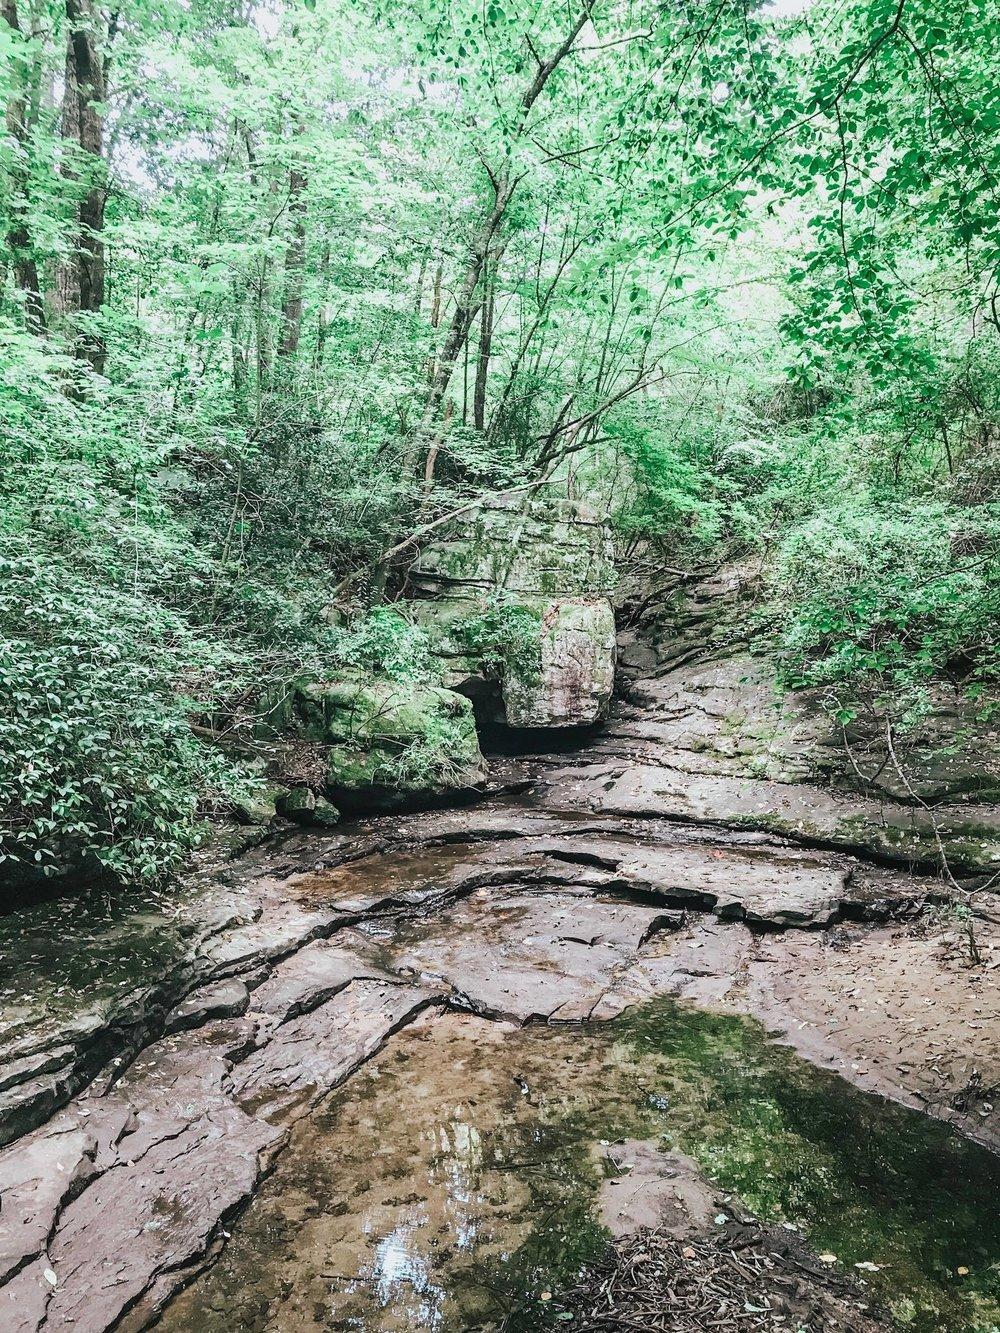 Azalea Cascades at the beginning of the hike